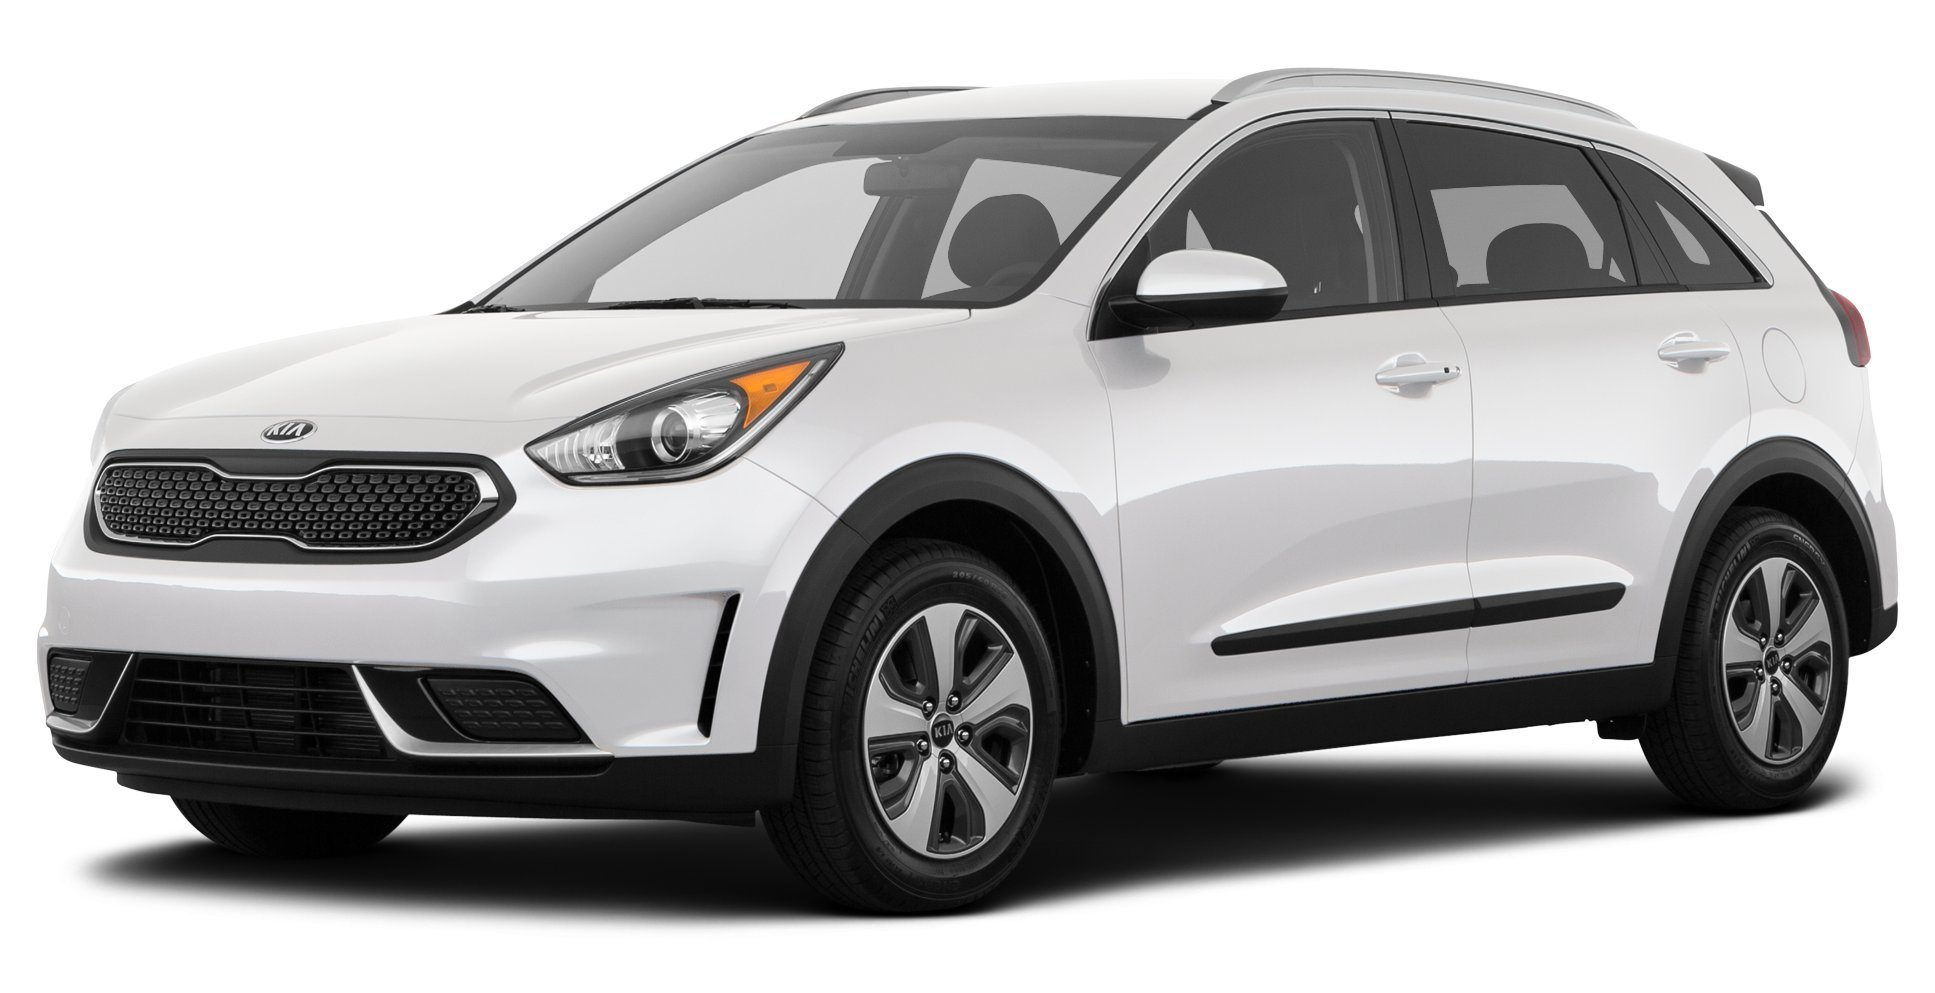 Amazon com: 2018 Chevrolet Equinox Reviews, Images, and Specs: Vehicles